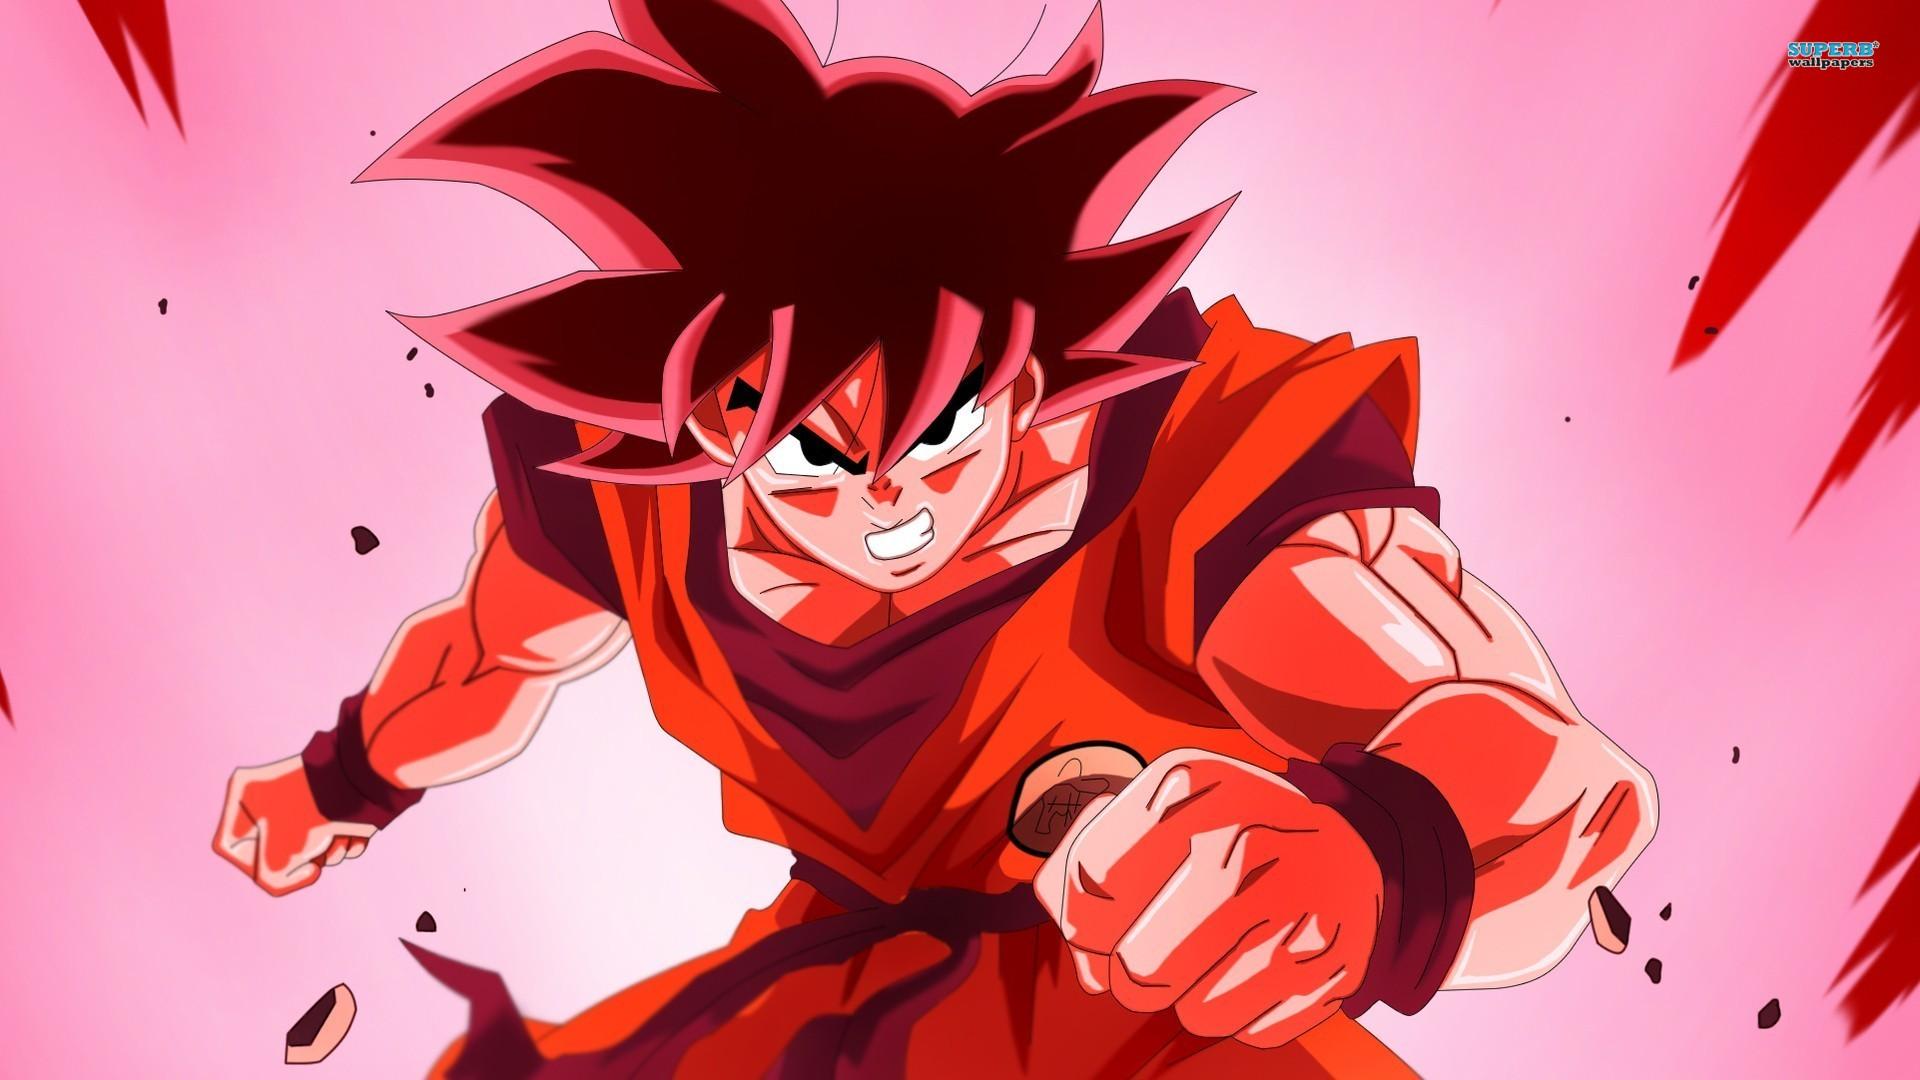 Goku   Dragon Ball Z Wallpaper 35546698 1920x1080